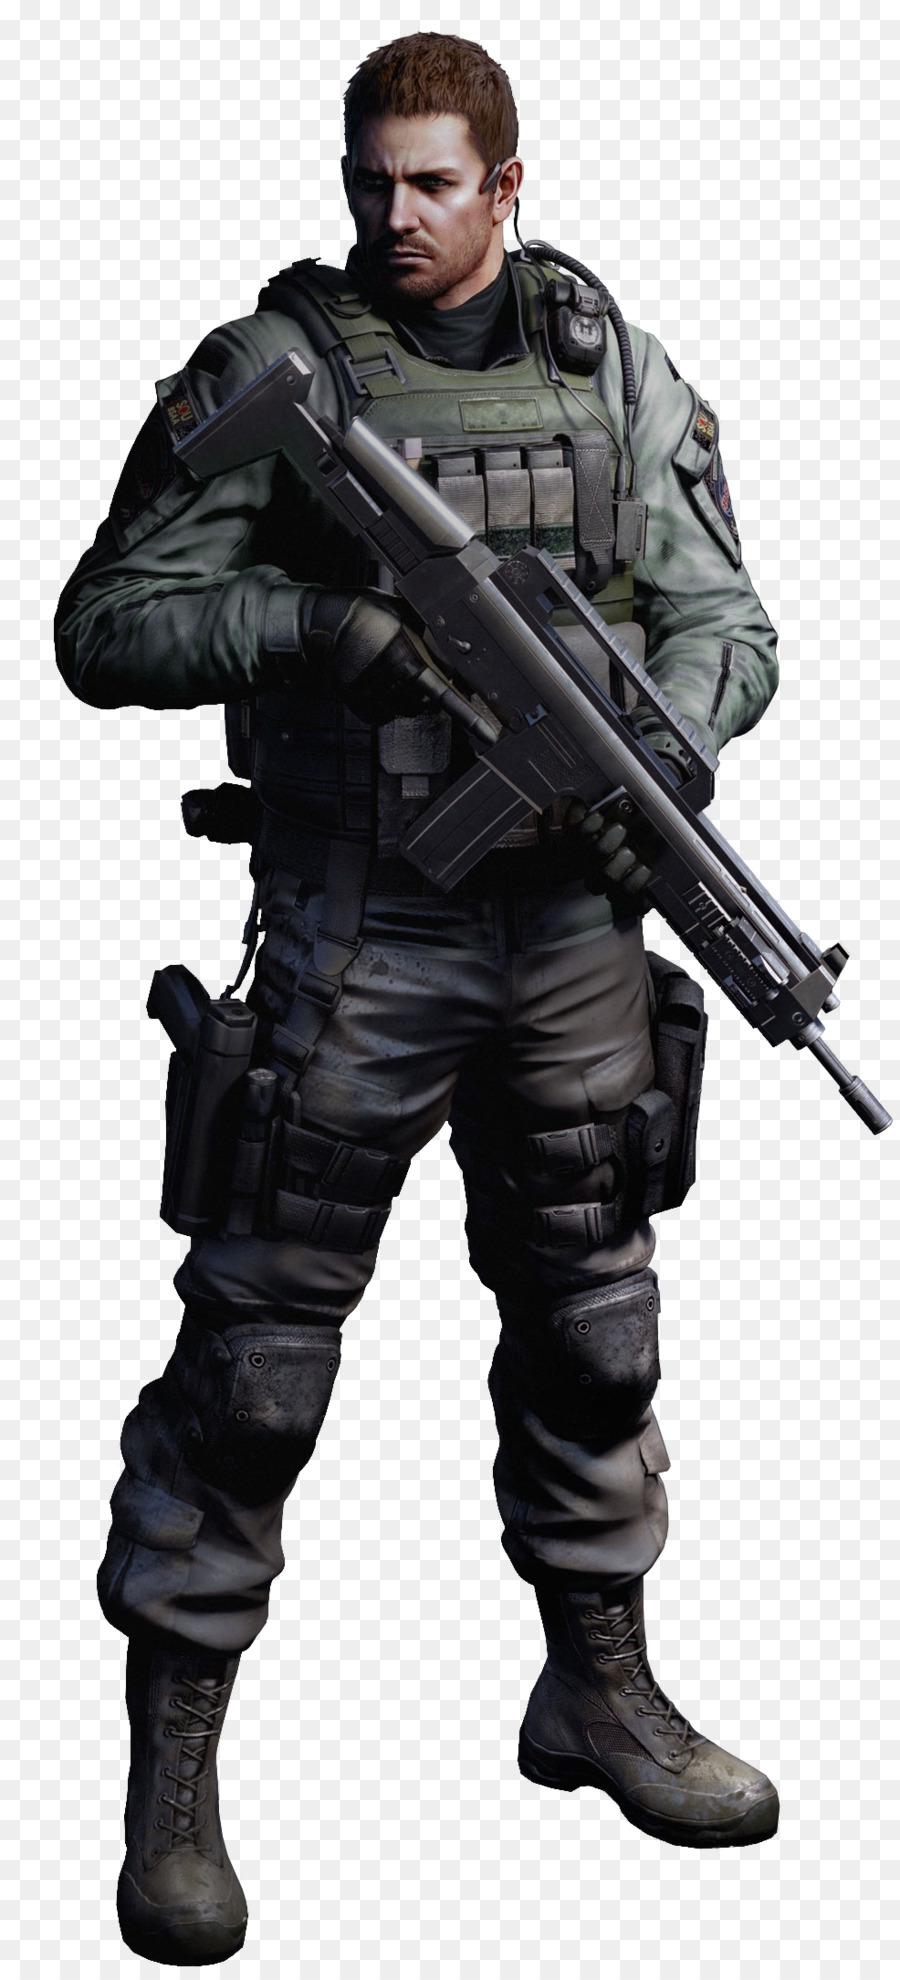 Police Uniform Png Download 986 2169 Free Transparent